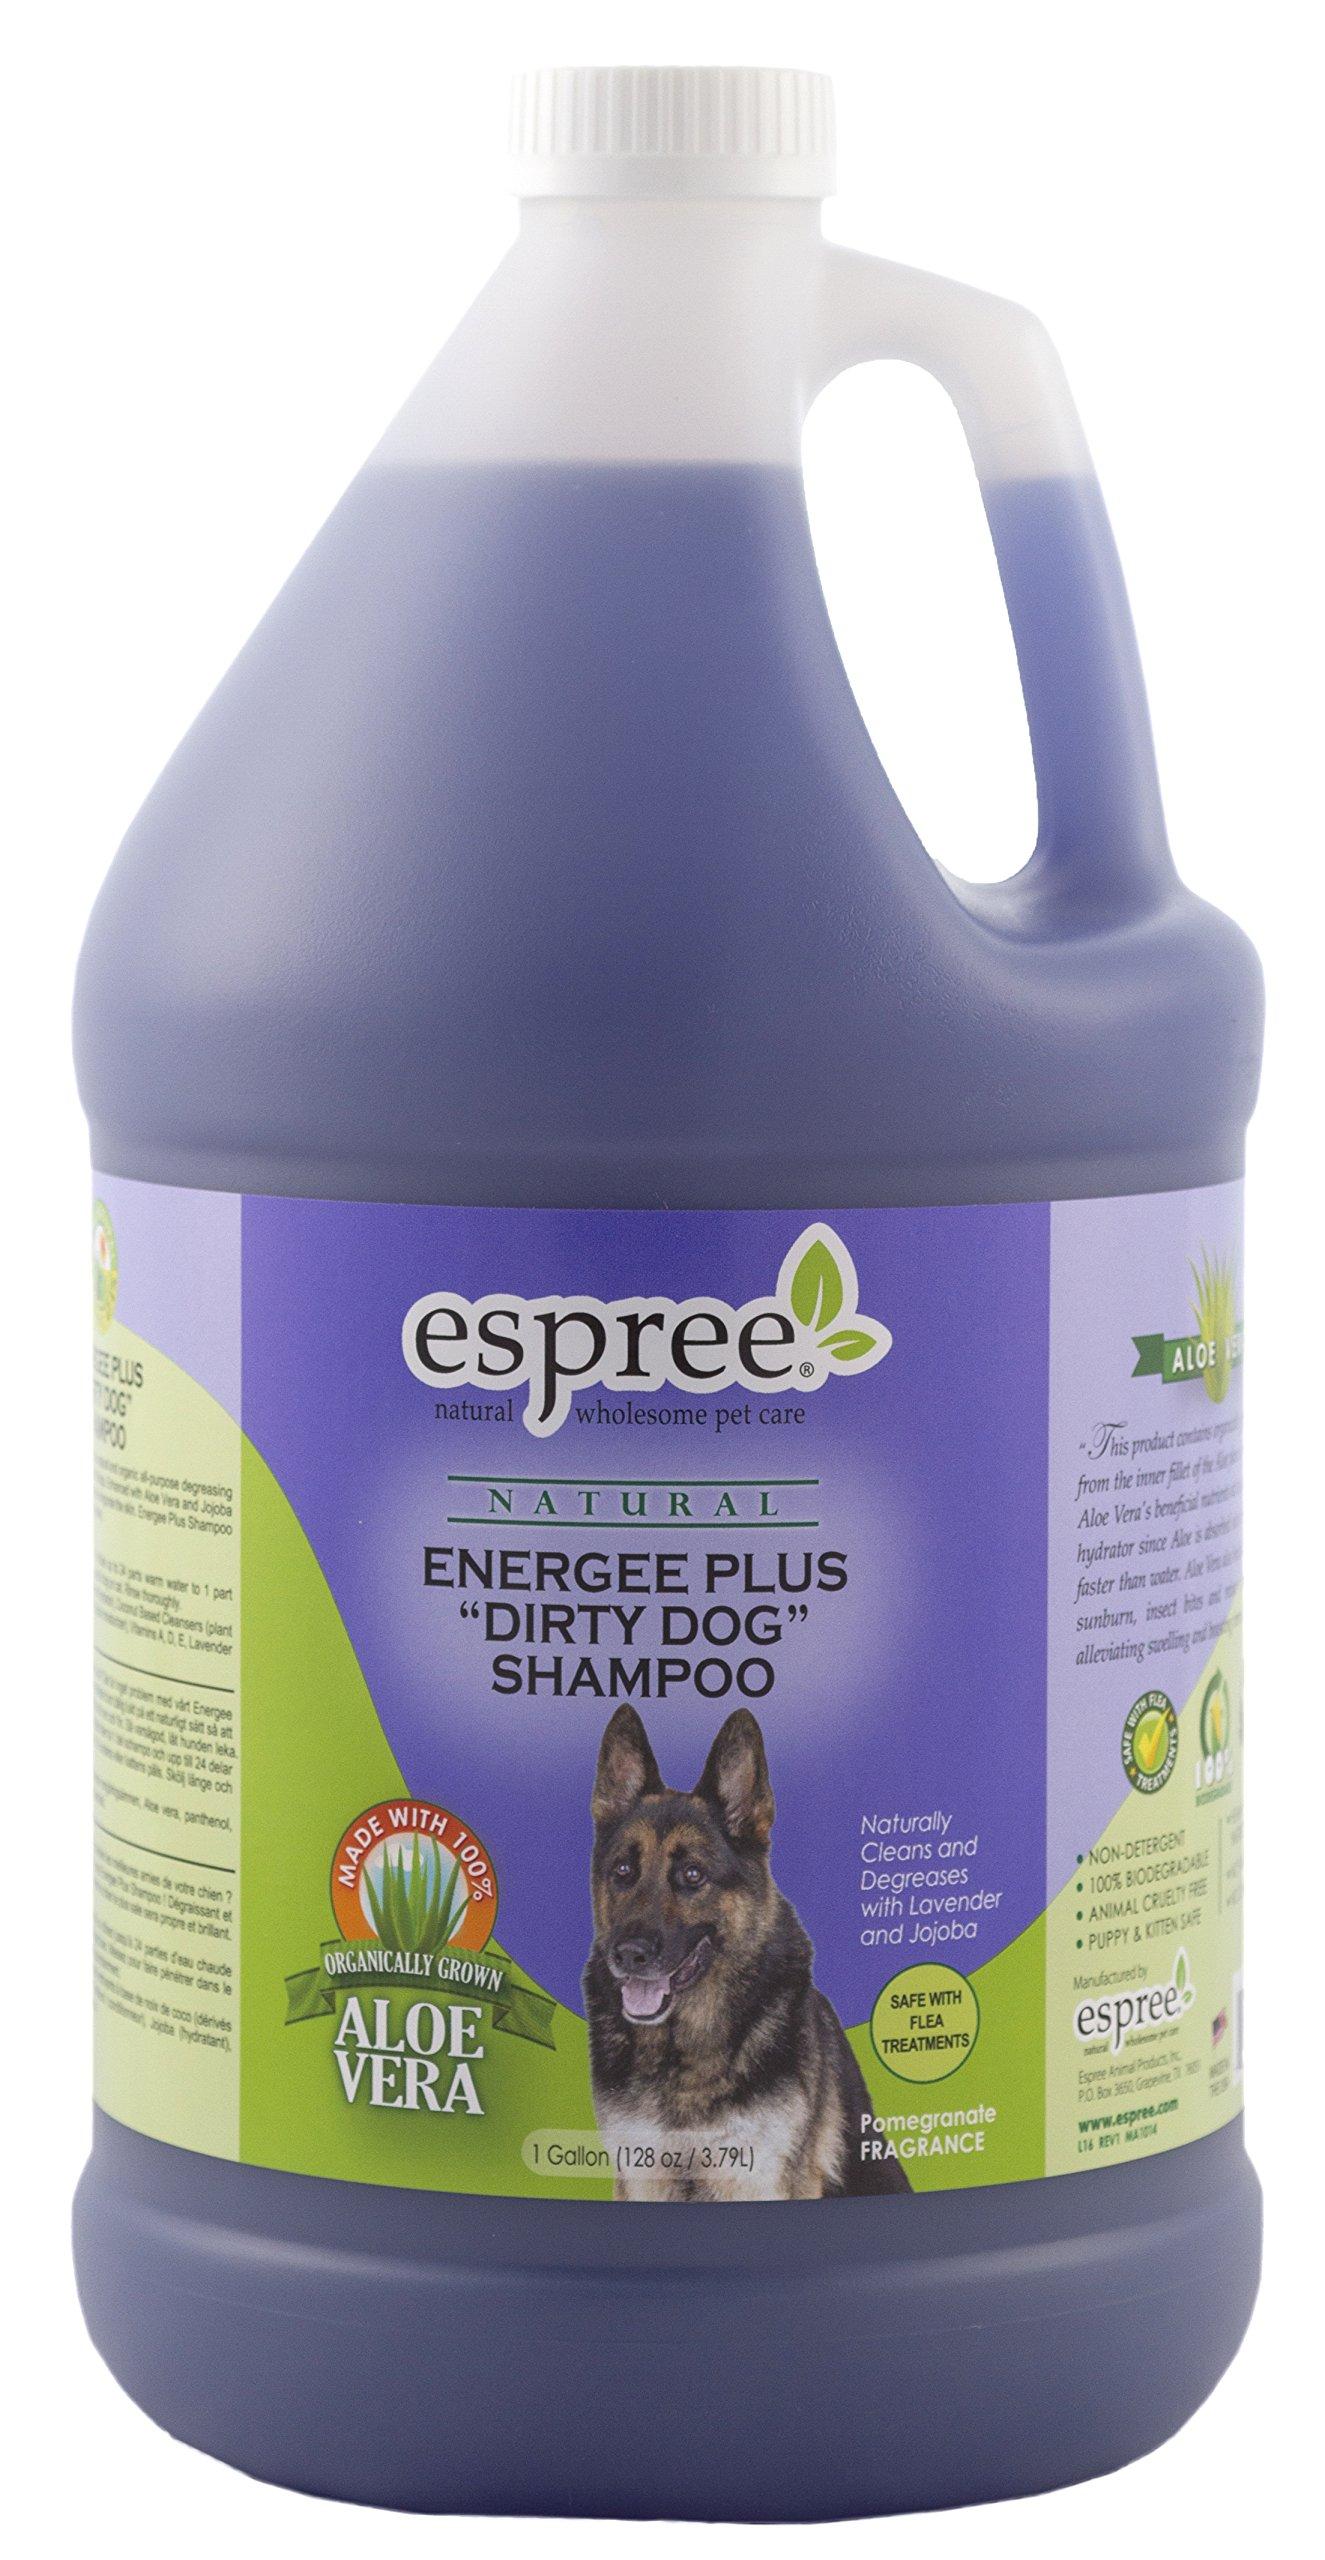 Espree Energee Plus ''Dirty Dog'' Shampoo, 1 gallon